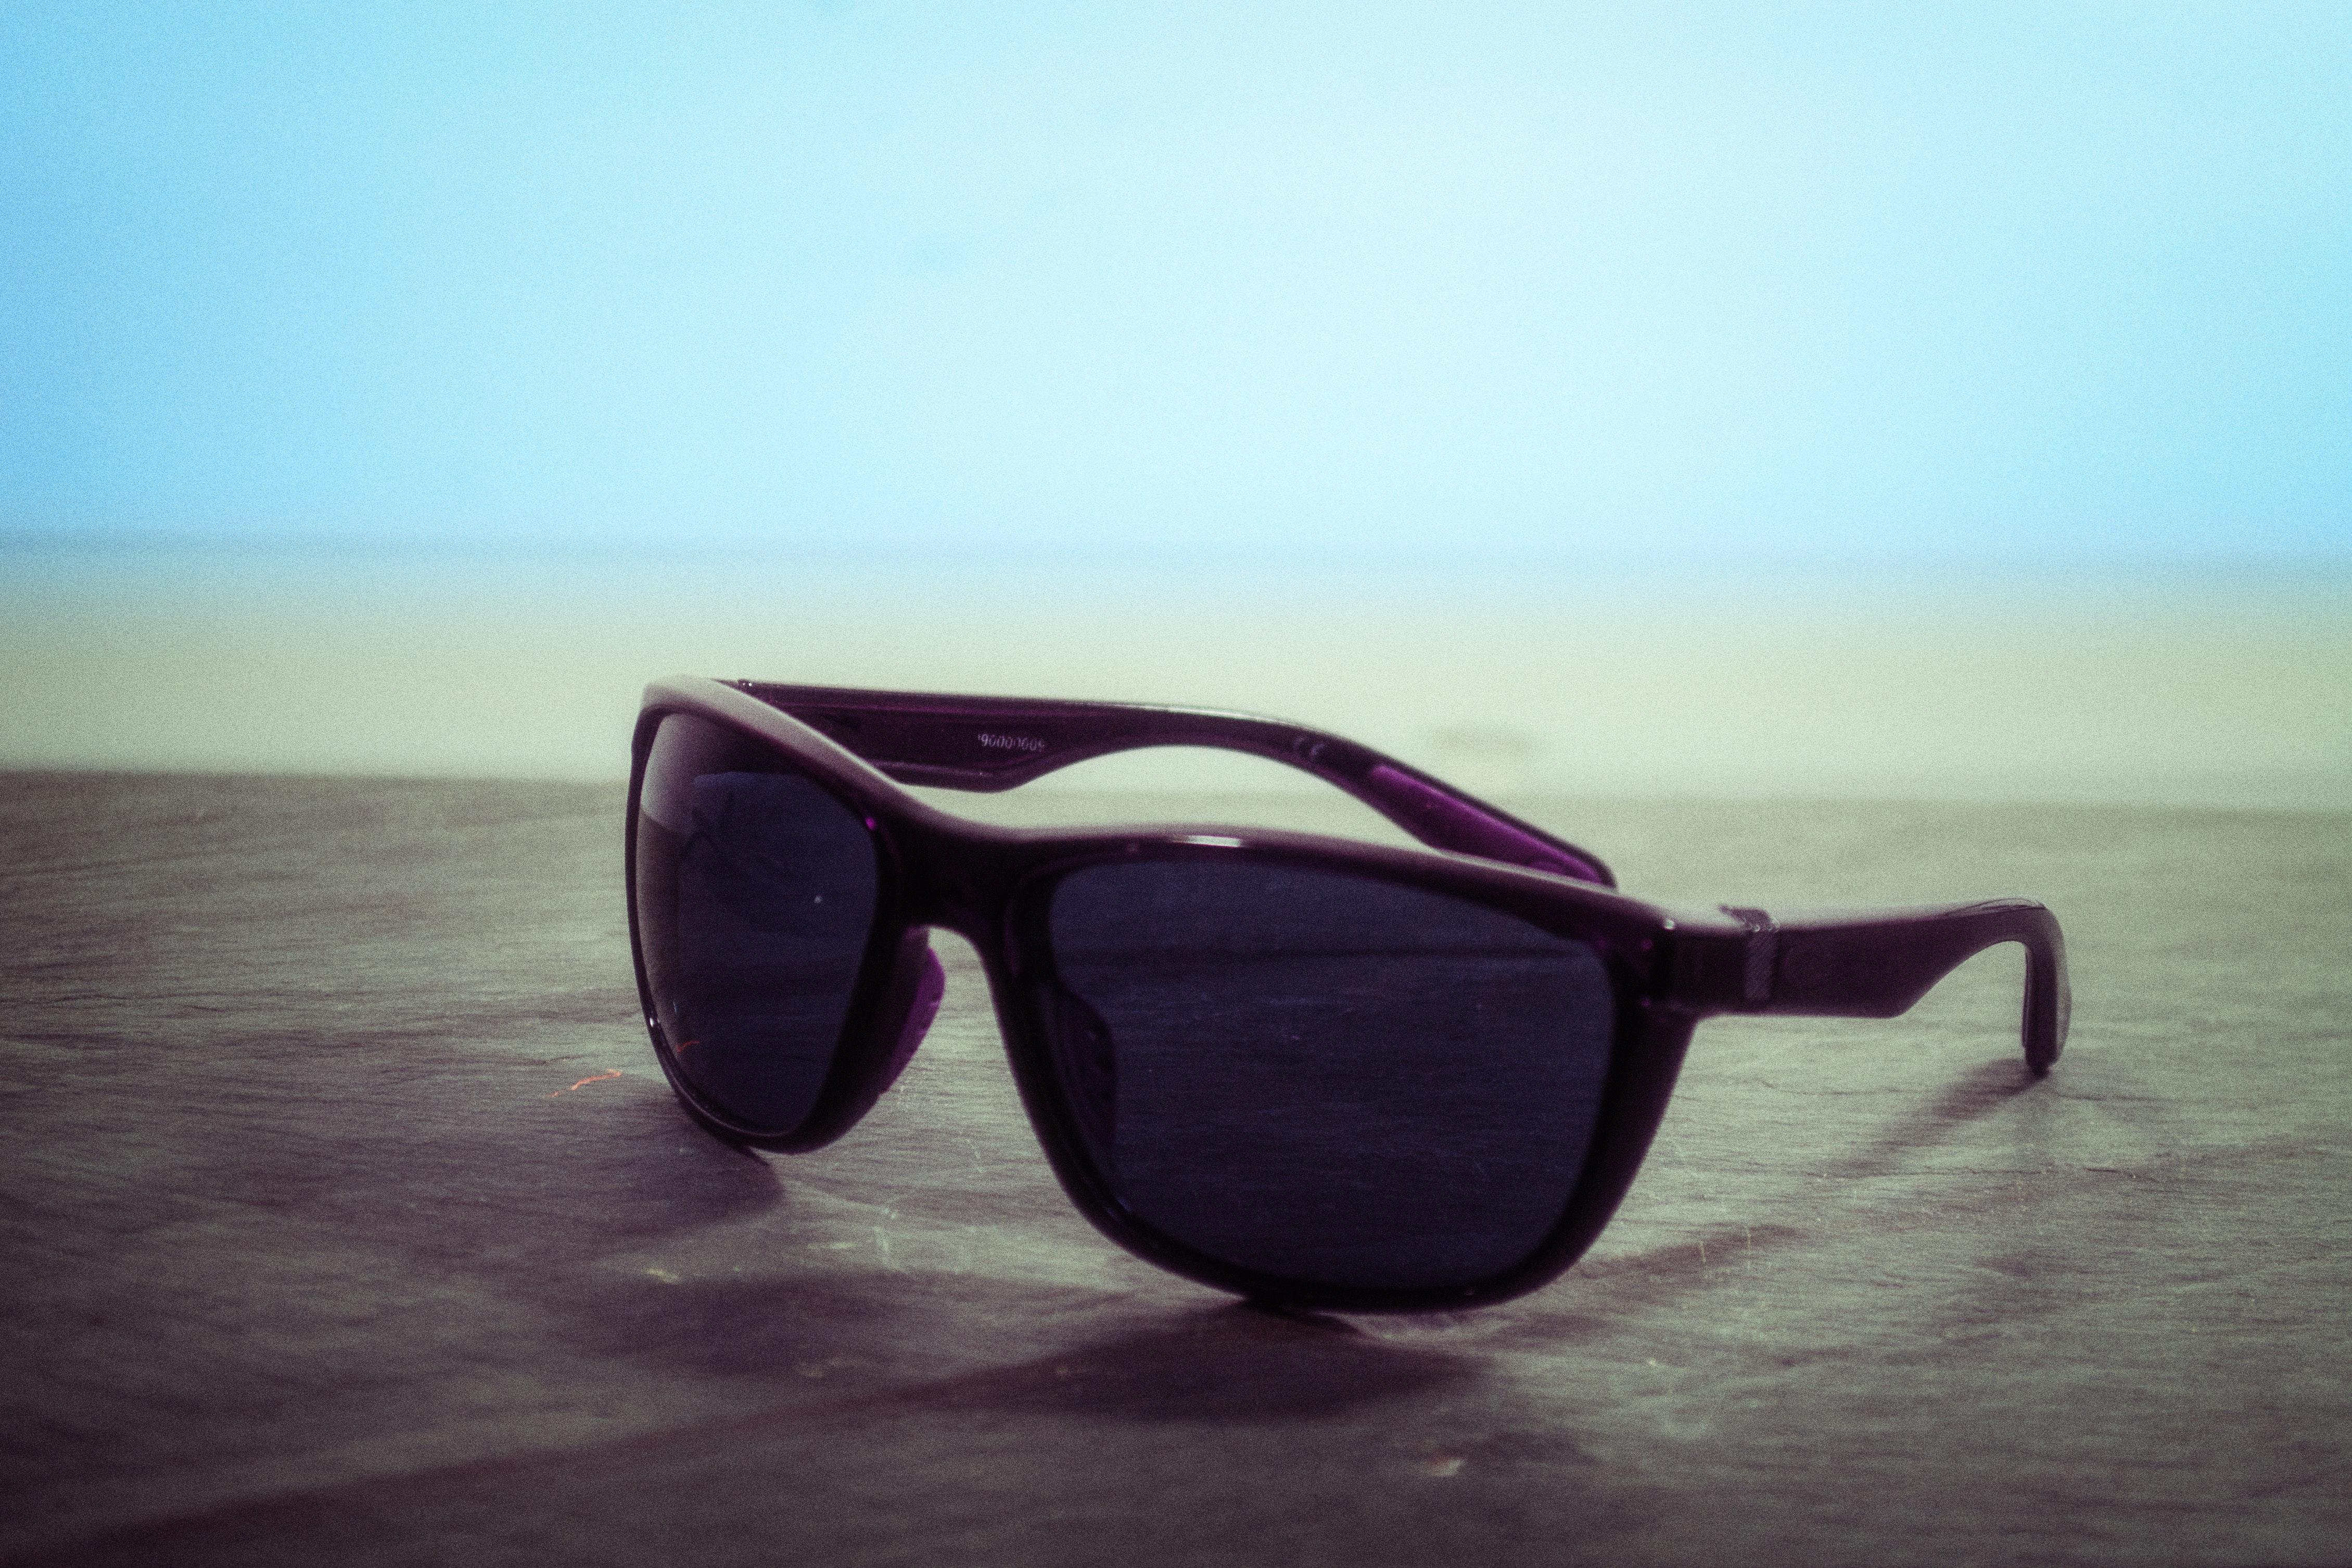 Black wayfarer sunglasses photo